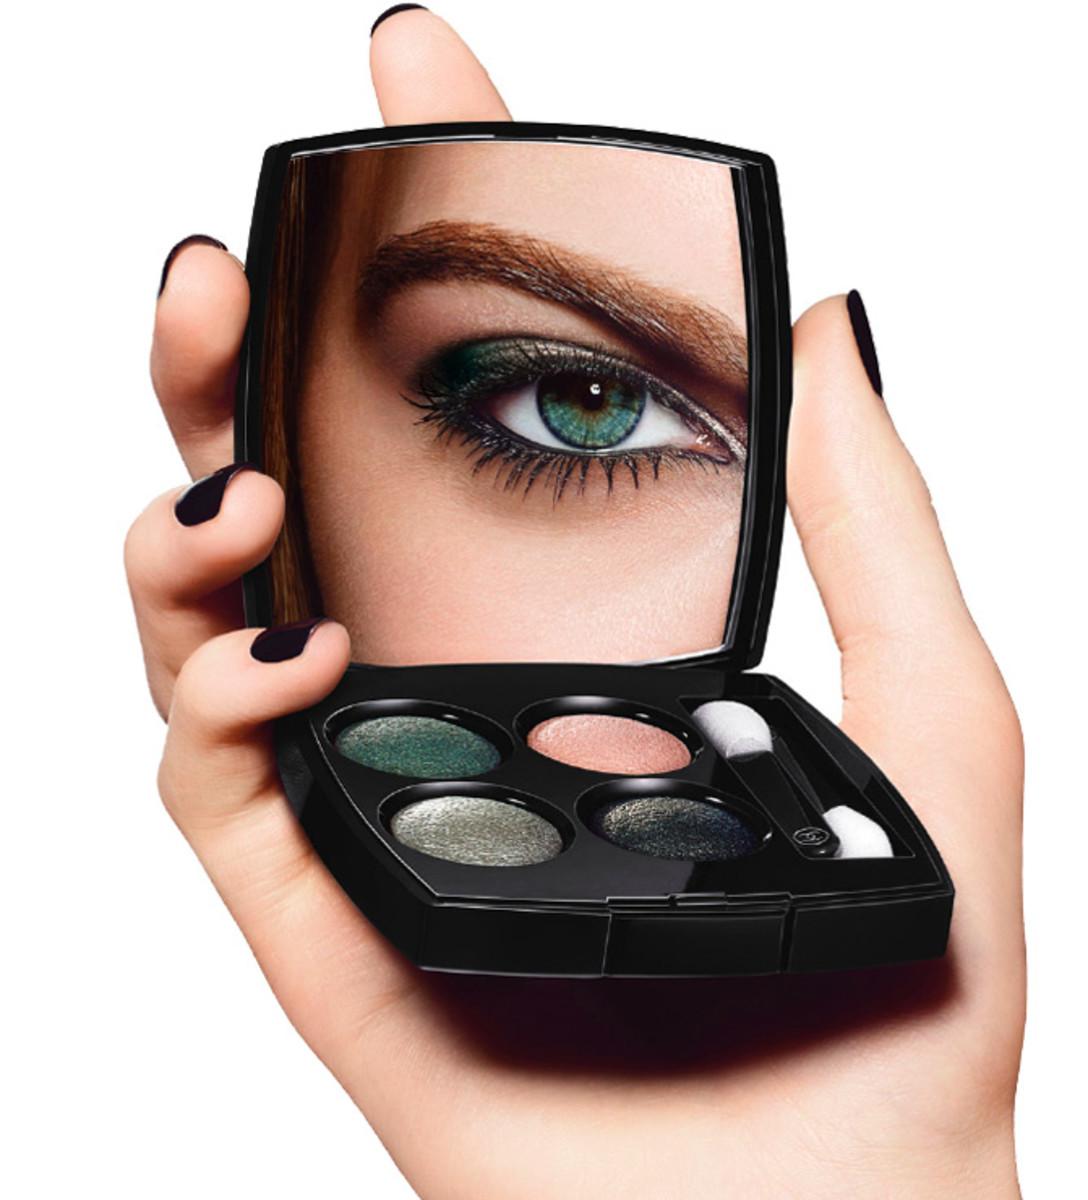 CHANEL Eye Makeup Chart_CHANEL INTENSE EYES LOOK_beauty shot